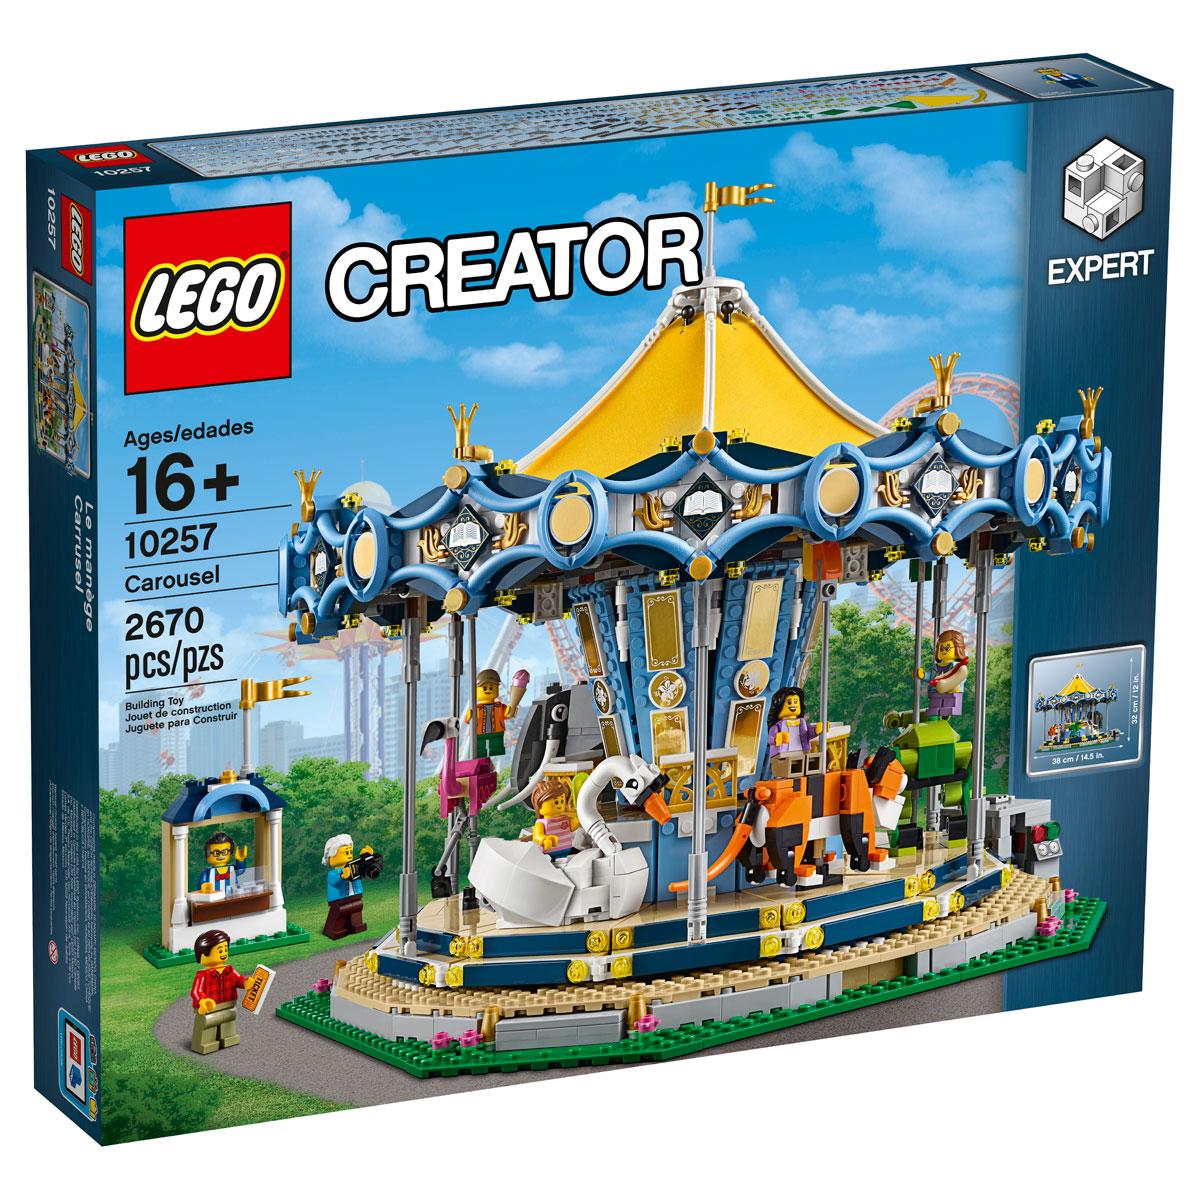 LEGO Creator Expert Carousel (10257